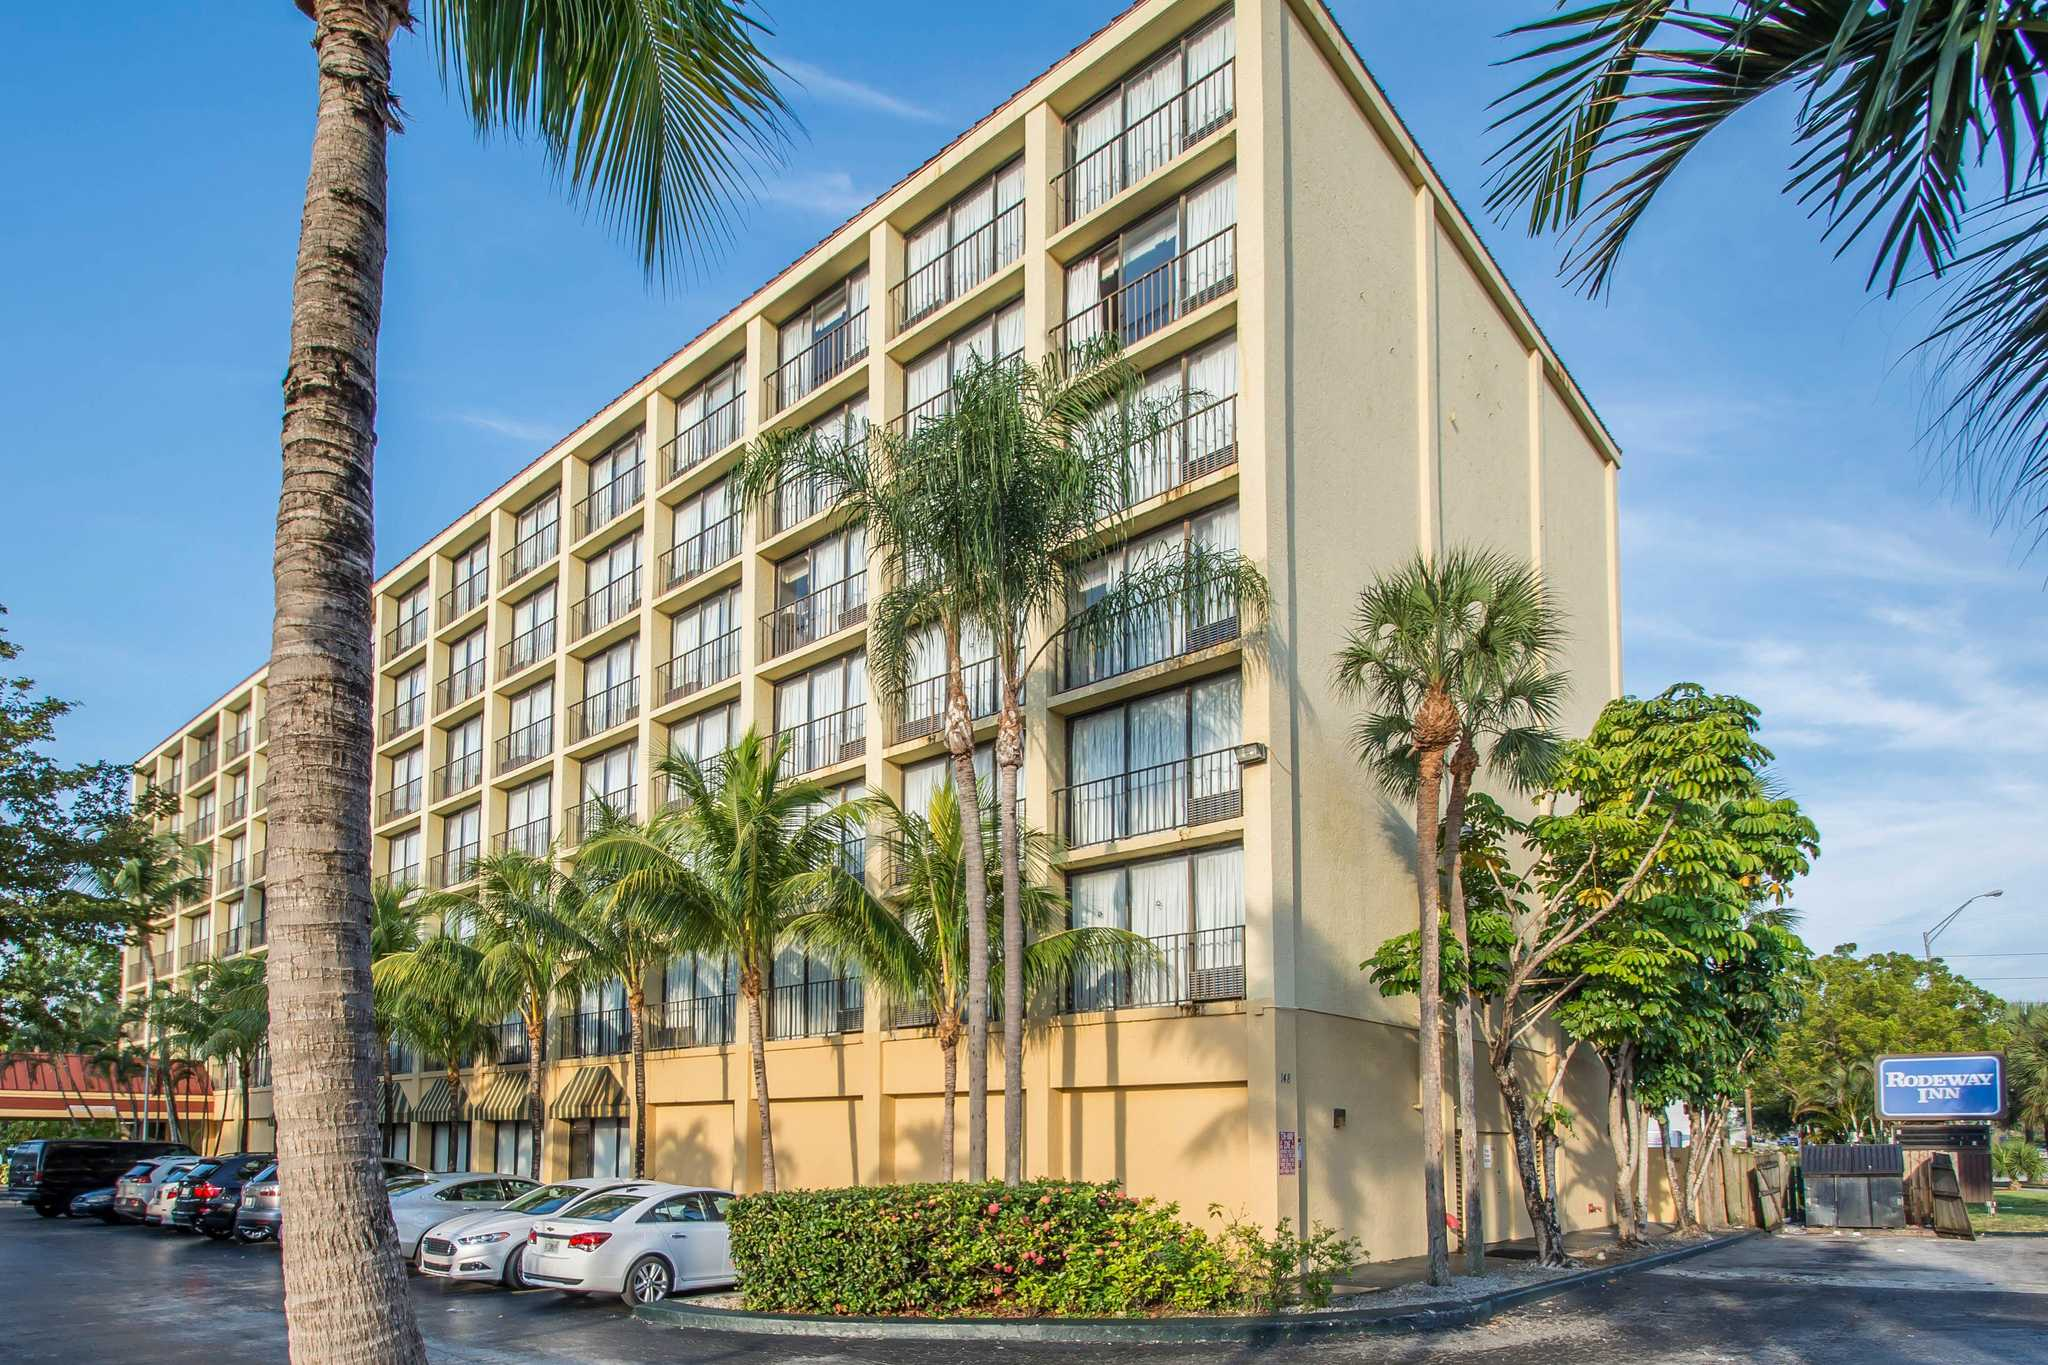 Rodeway Inn Miami image 0